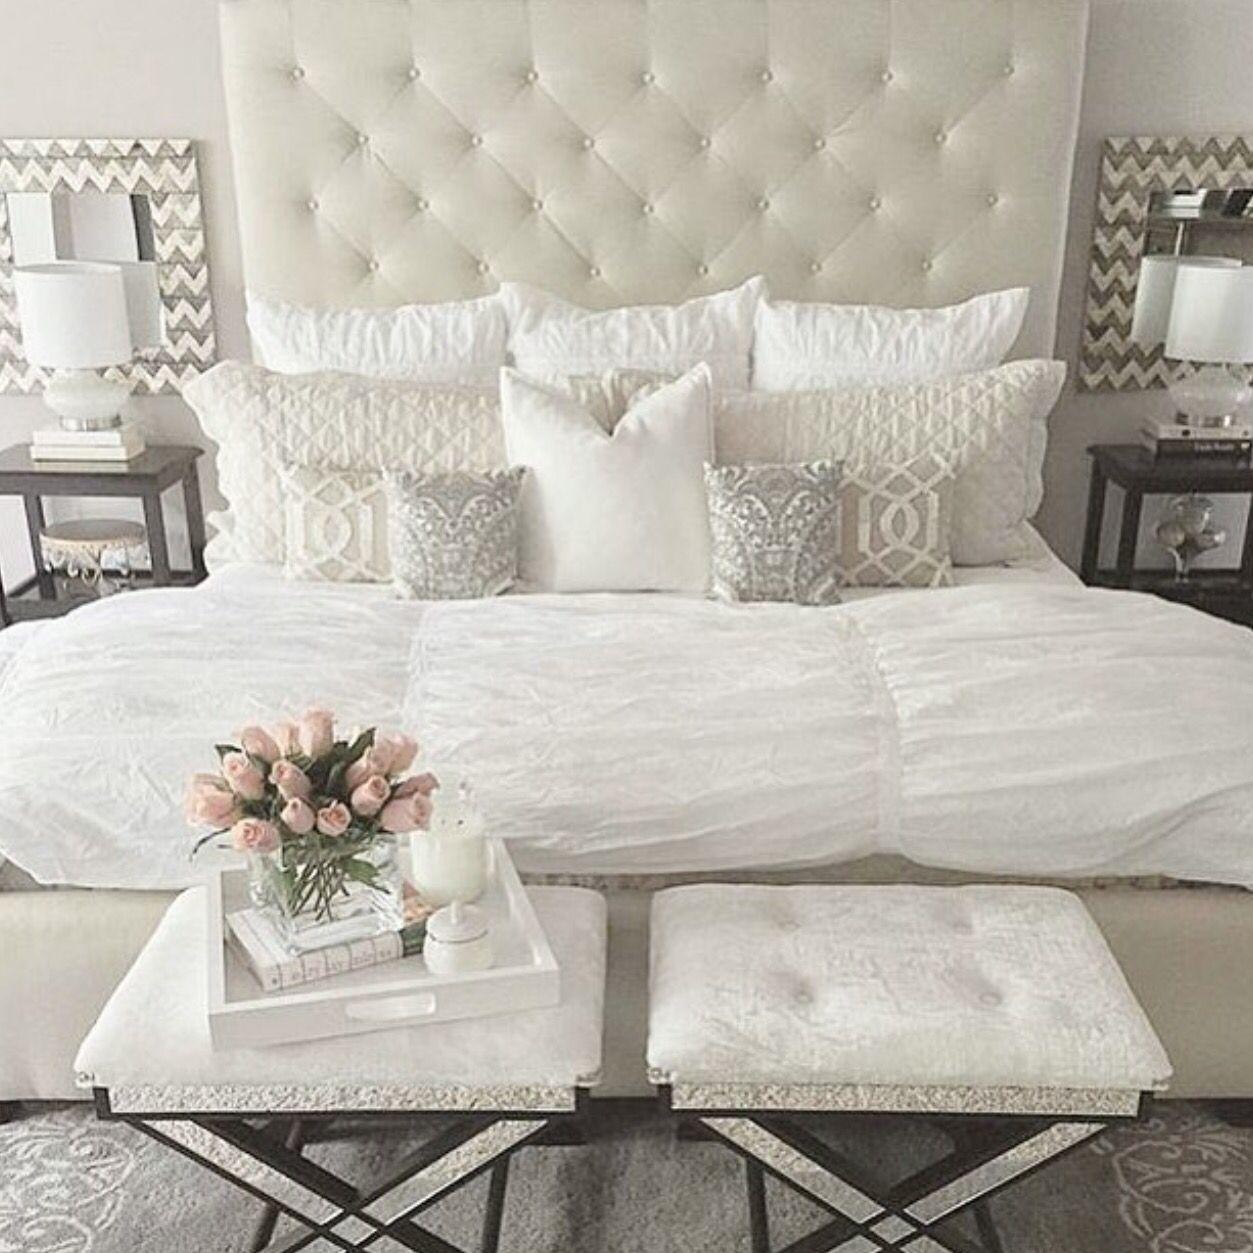 Neutral Glamorous Bedroom Home Bedroom Luxurious Bedrooms Master Bedrooms Decor